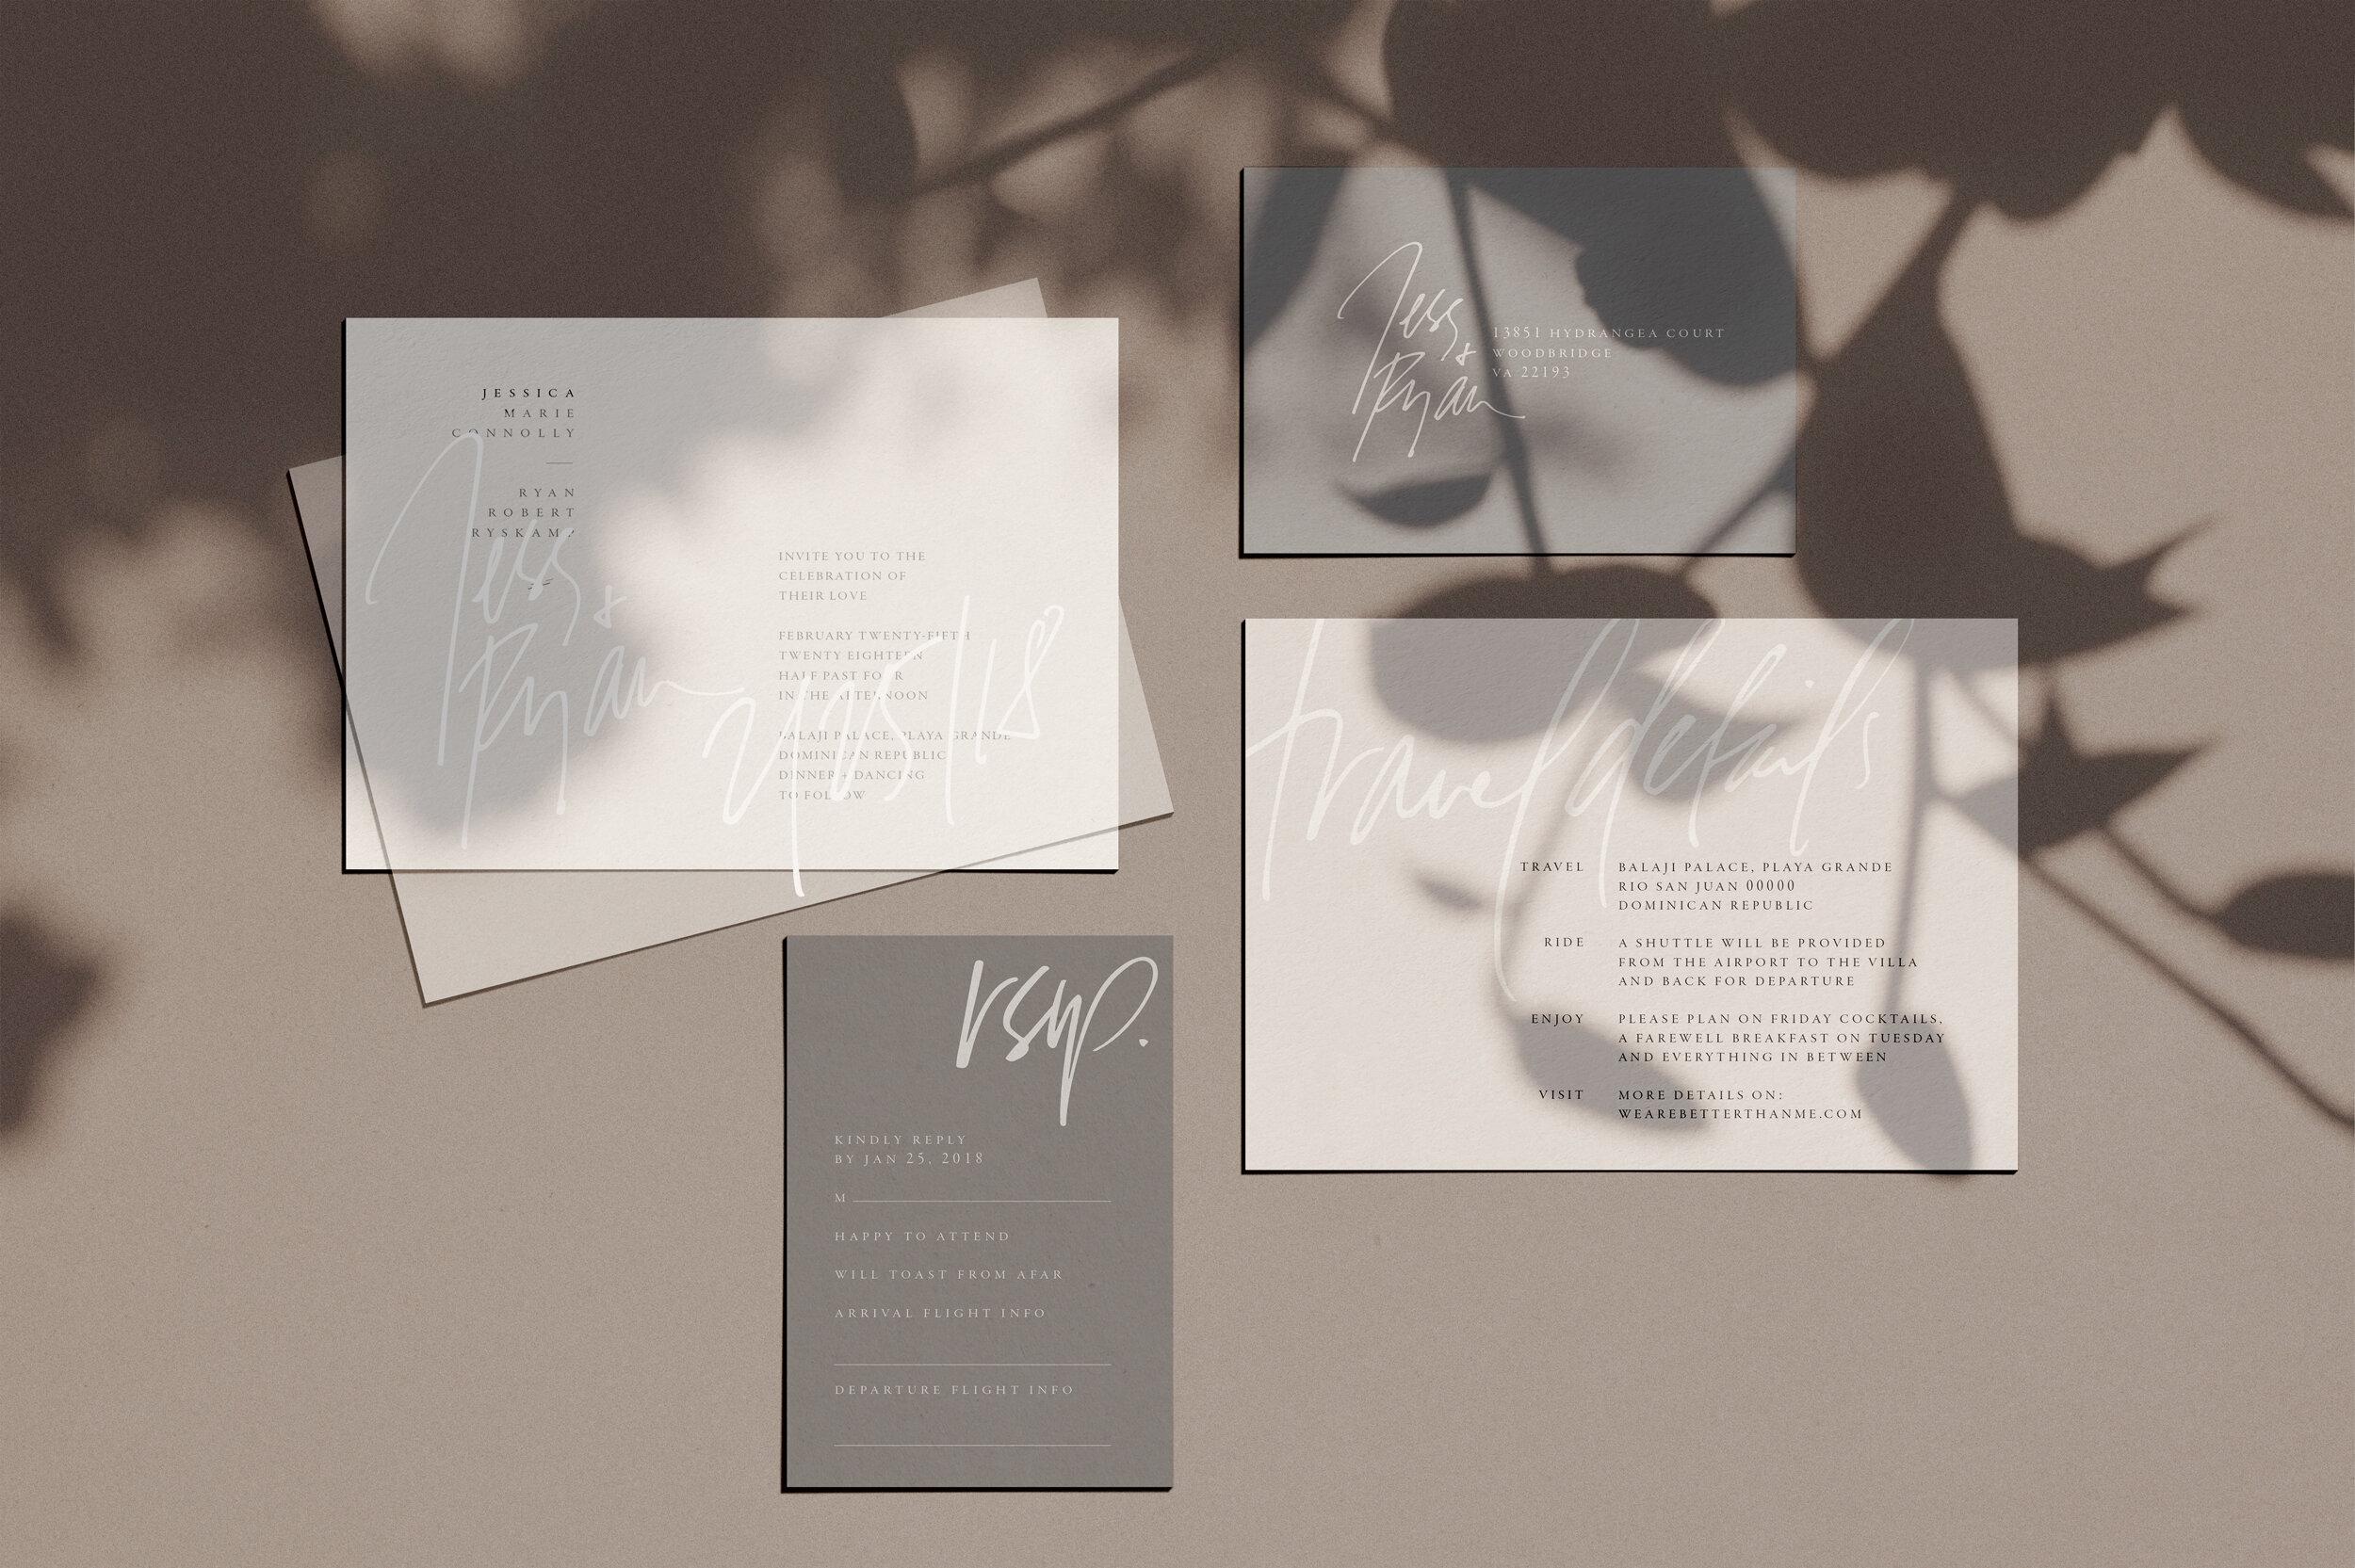 The-Letterist-Featured-in-Martha-Stewart-Weddings.jpg